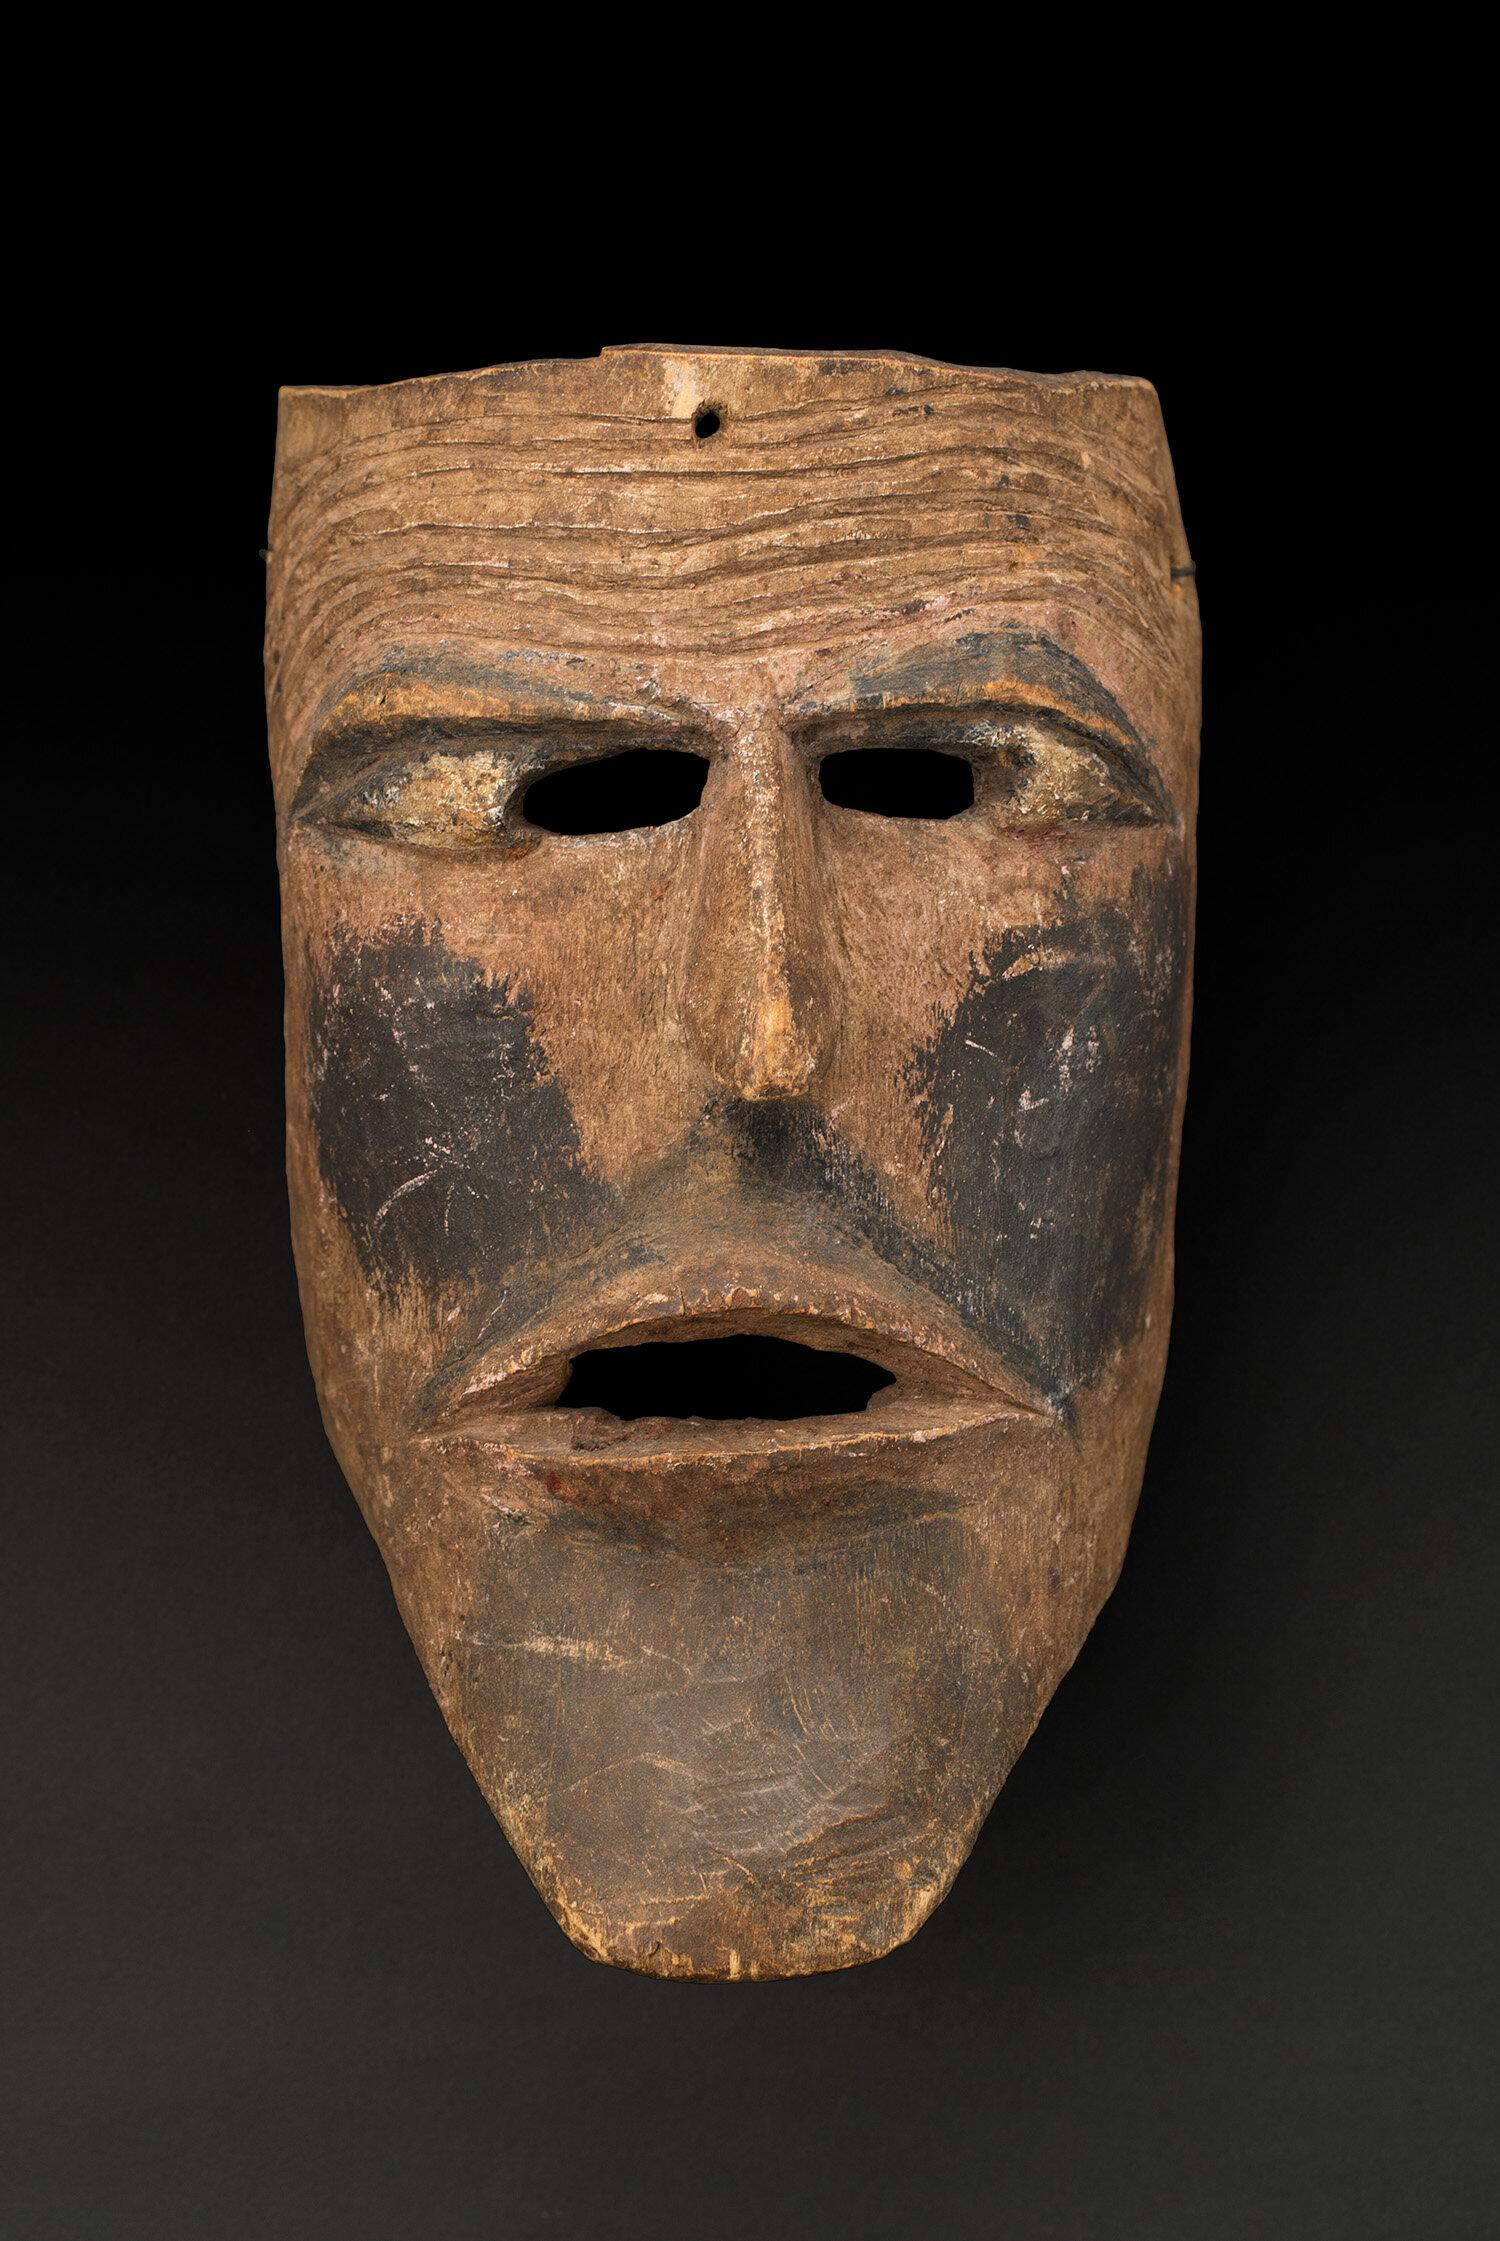 Masks  Puebla Pilato character?  , pre 1960 Polychrome wood 9.5 x 5.5 x 4.5 inches 24.1 x 14 x 11.4 cm M 369